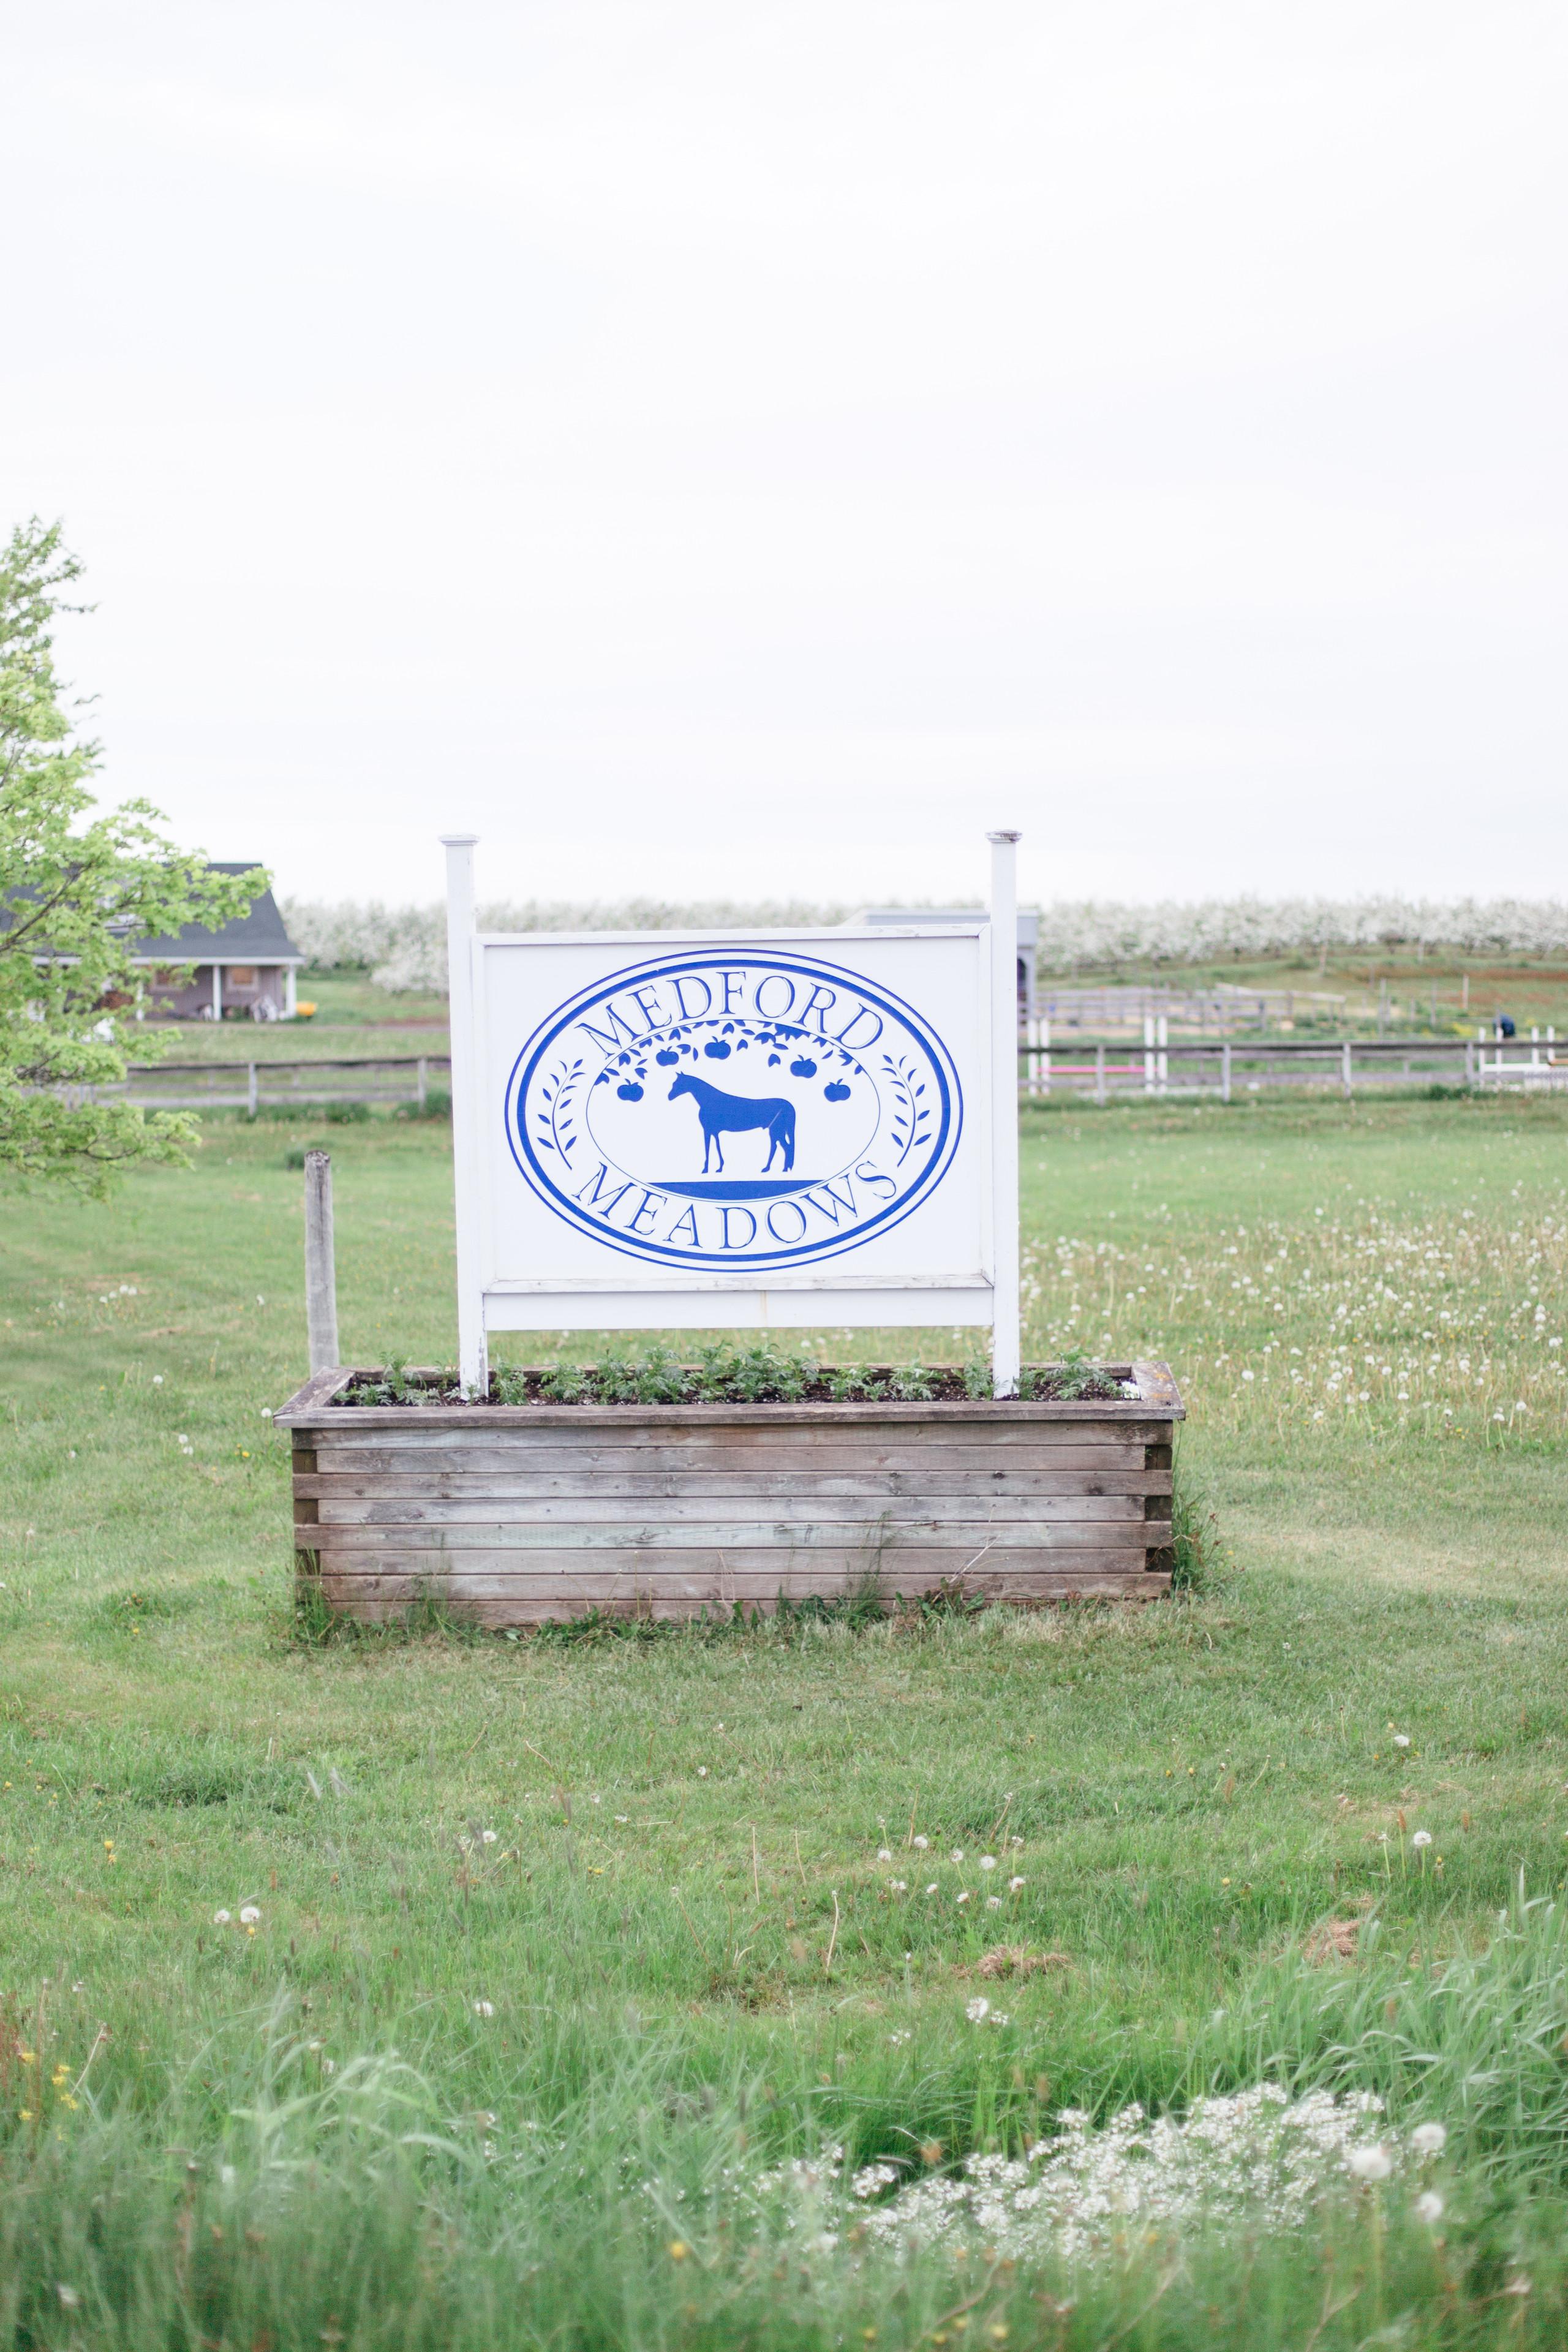 medford meadows farm annapolis valley nova scotia